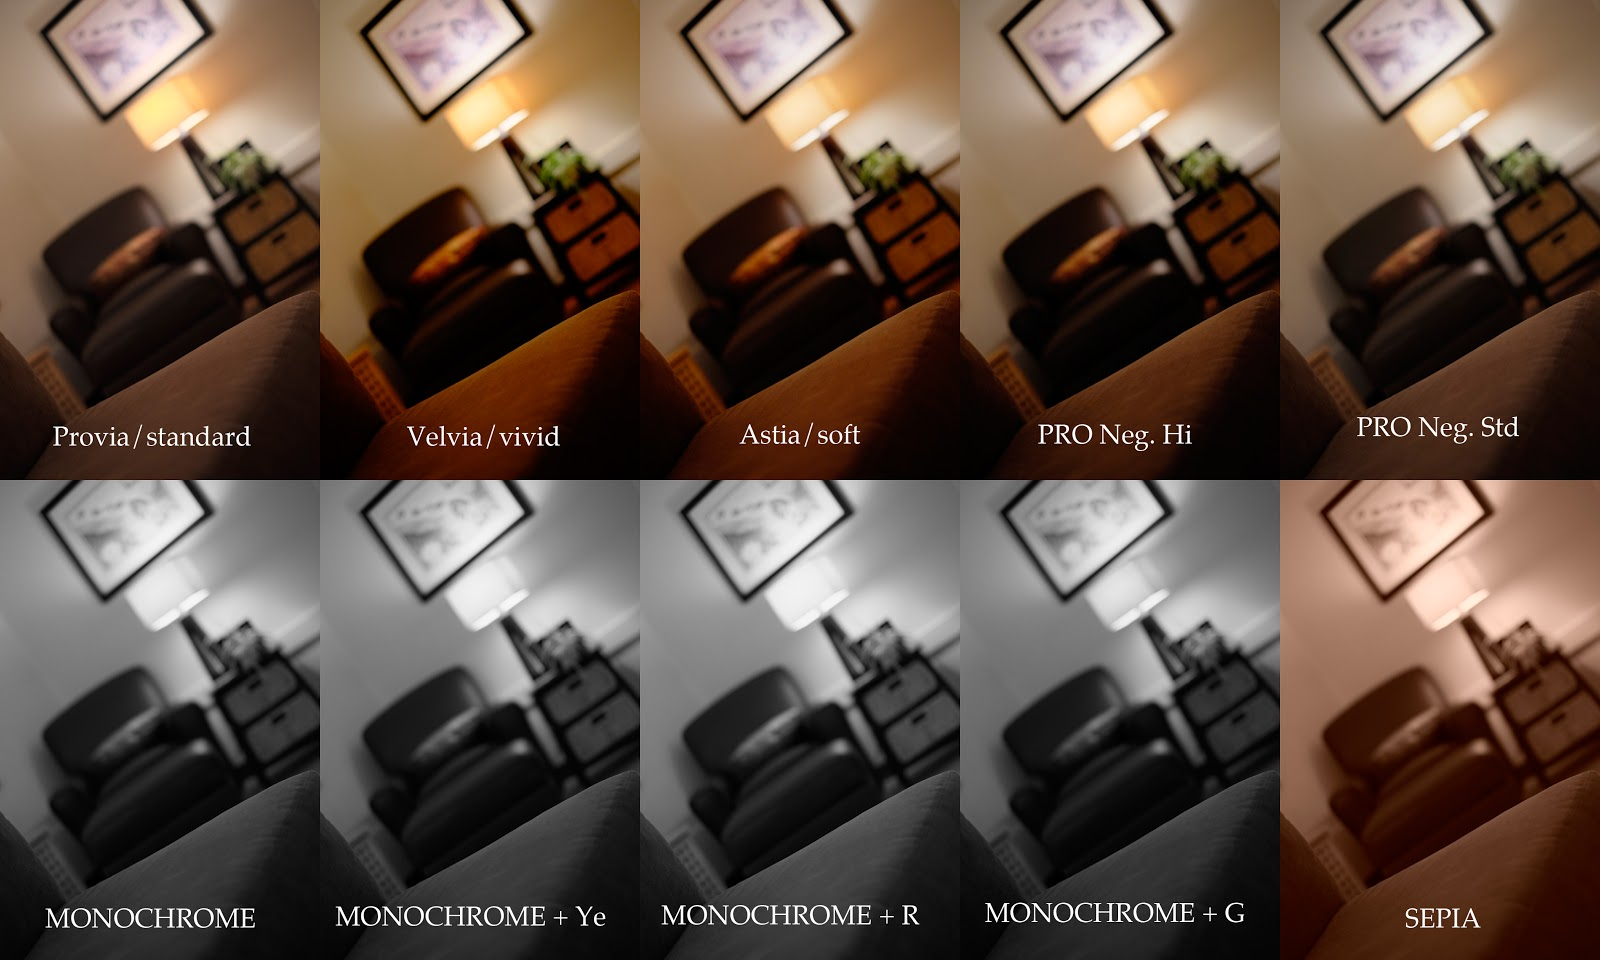 Deron Chang's Mirrorless Photo Blog: Using the Fuji X-E1